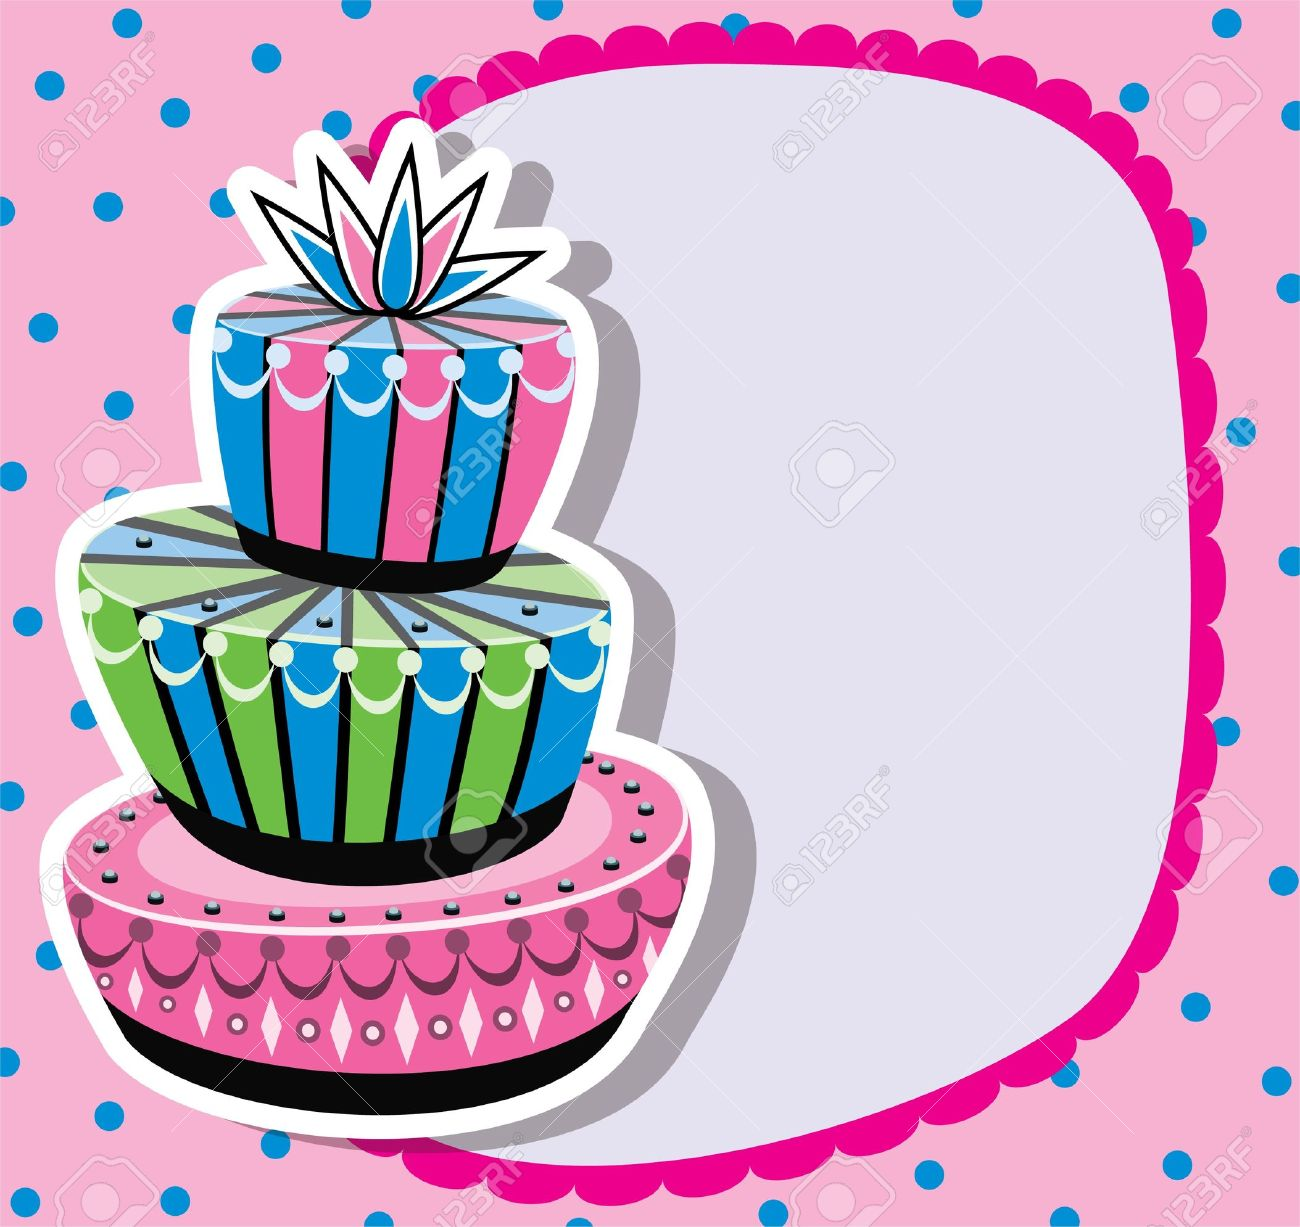 Birthday Cake Border Clipart.